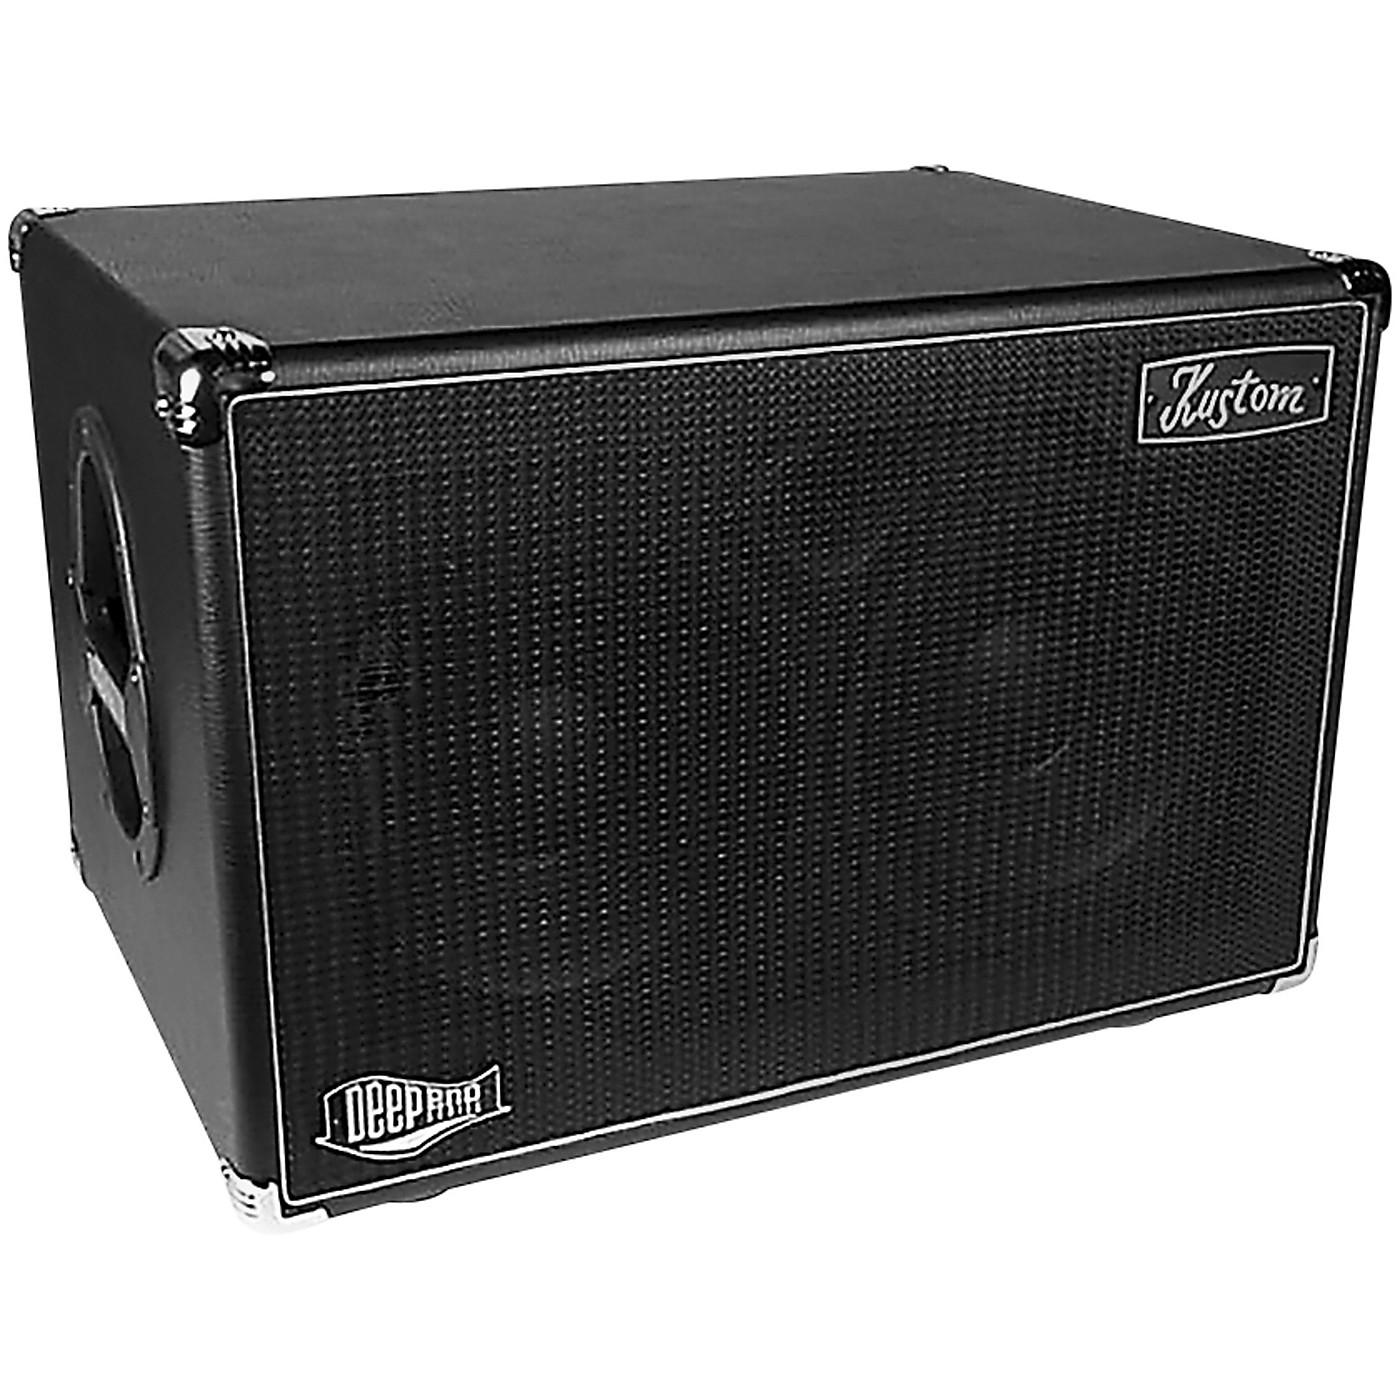 Kustom DEEP210 1,000W 2x10 Bass Speaker Cabinet thumbnail